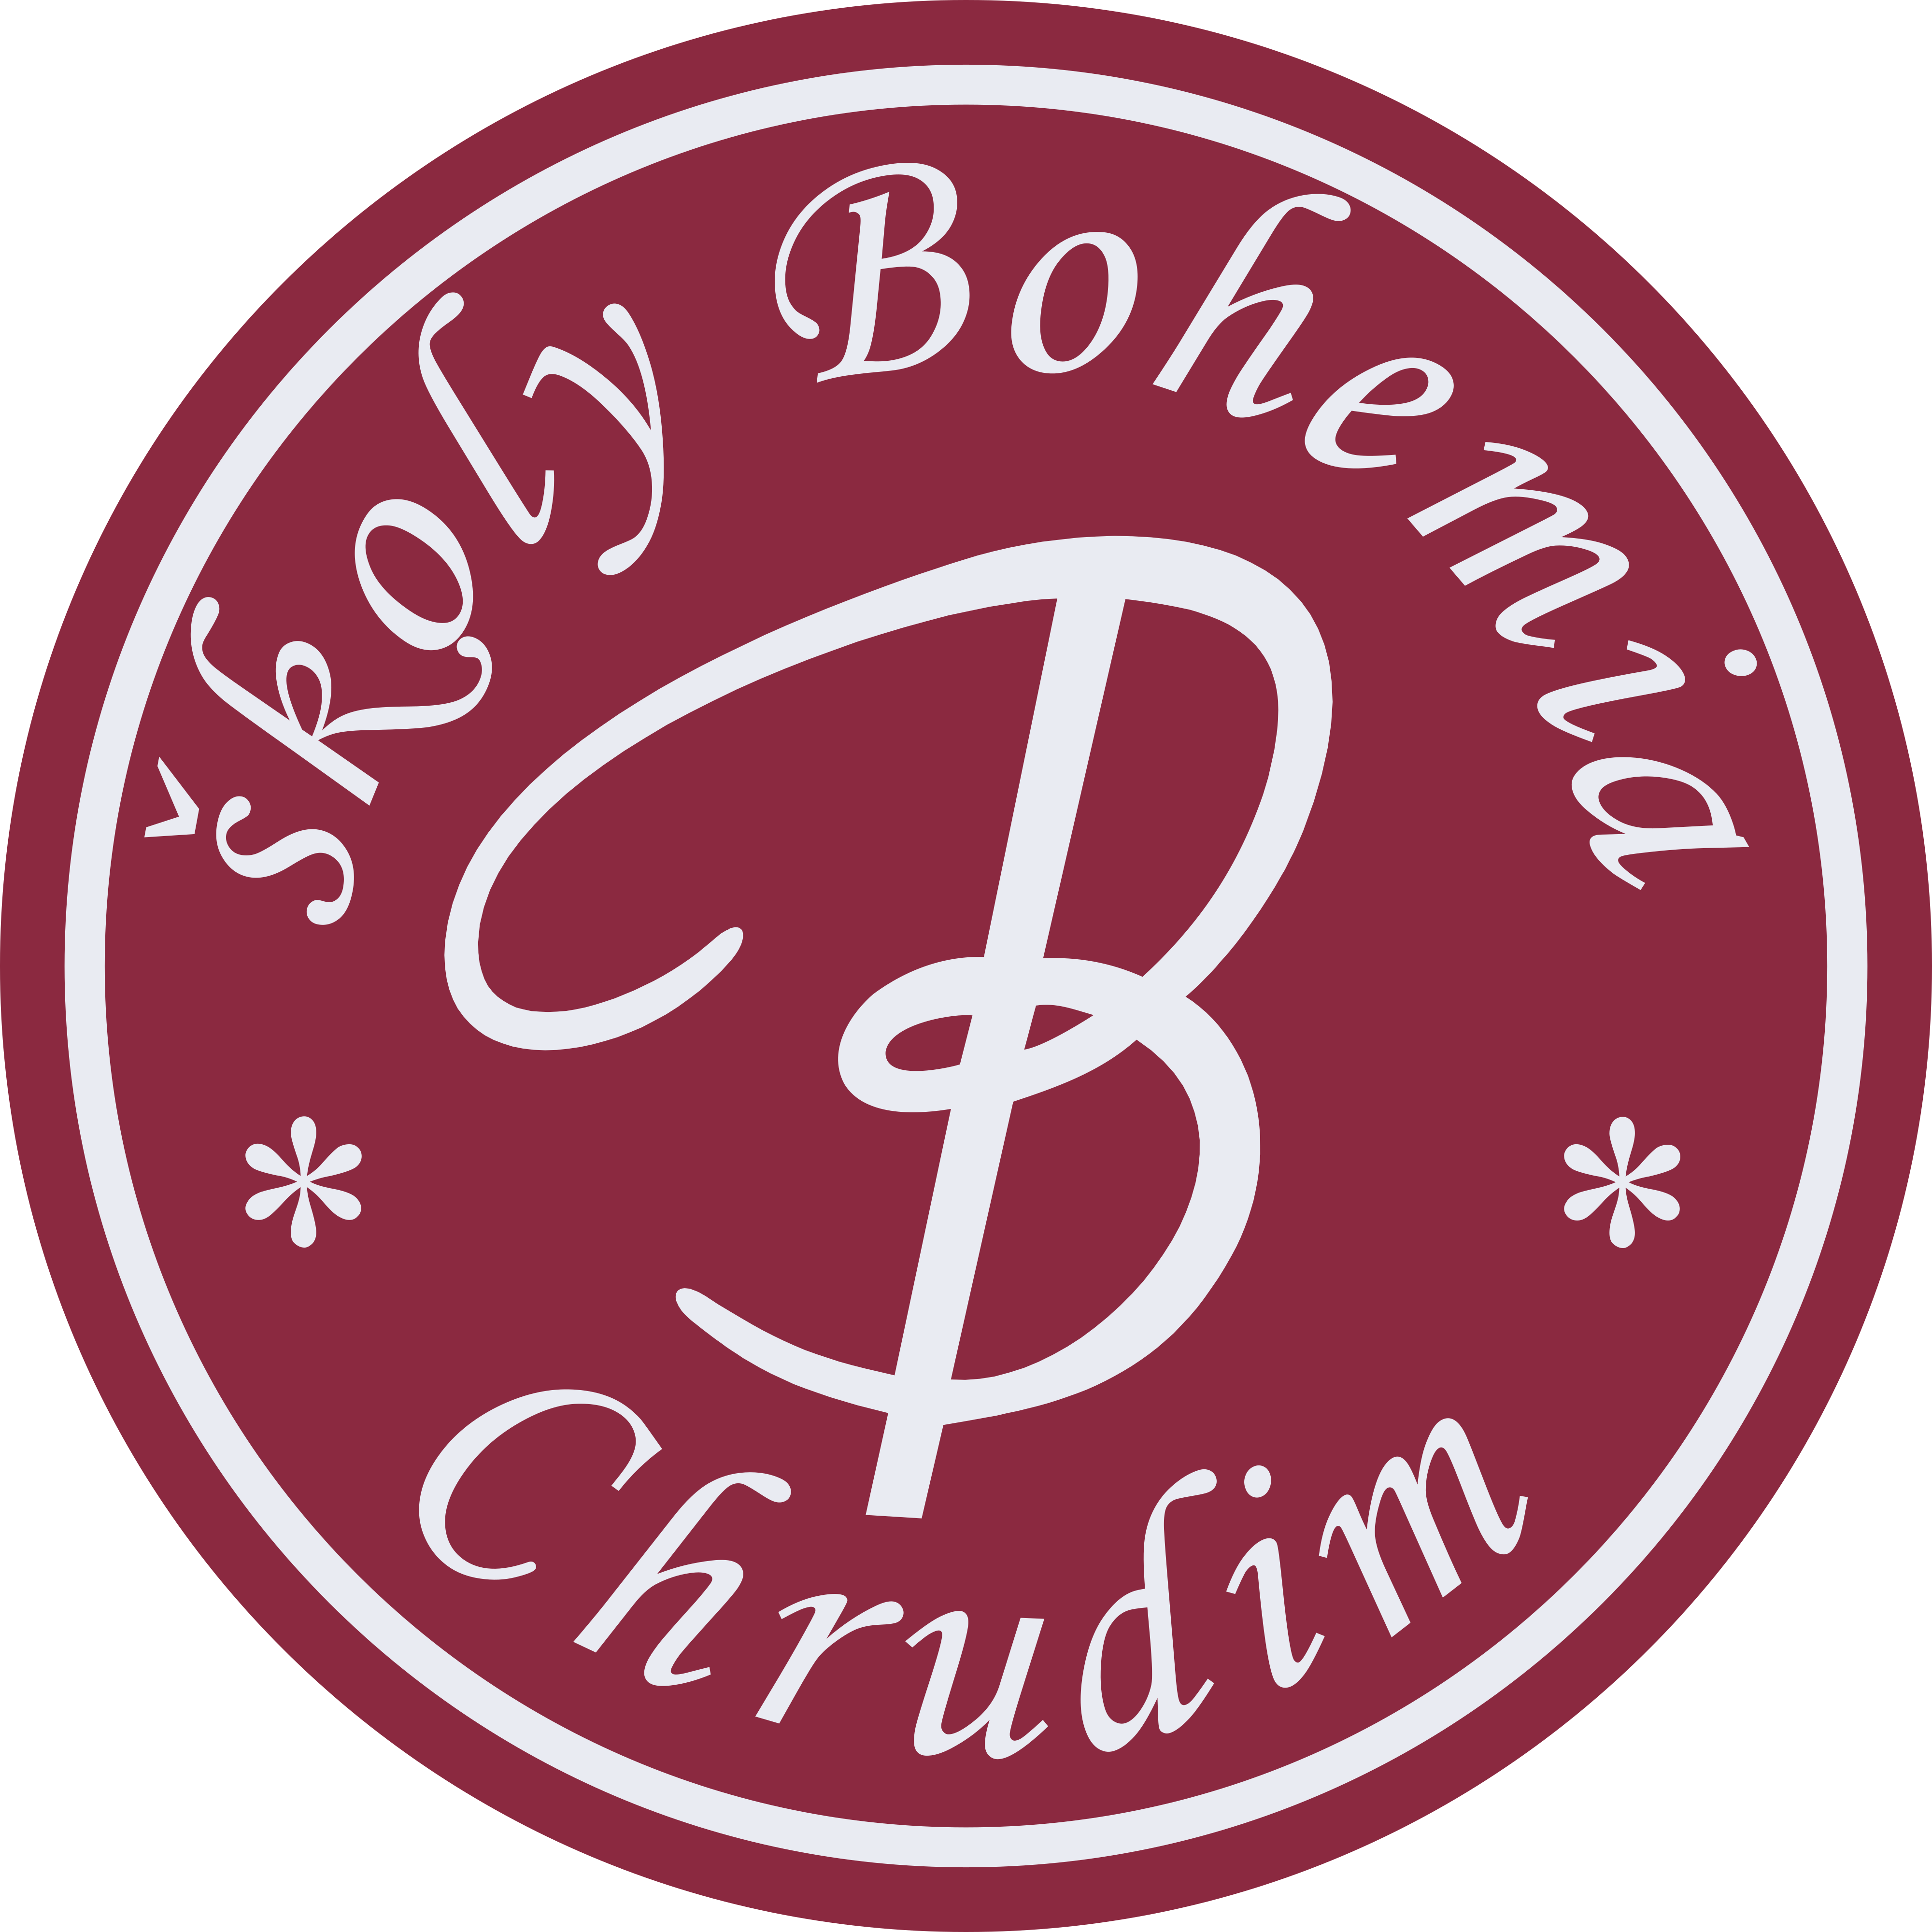 Bohemia – Hotelová škola a Střední pedagogická škola a Základní škola s.r.o. logo